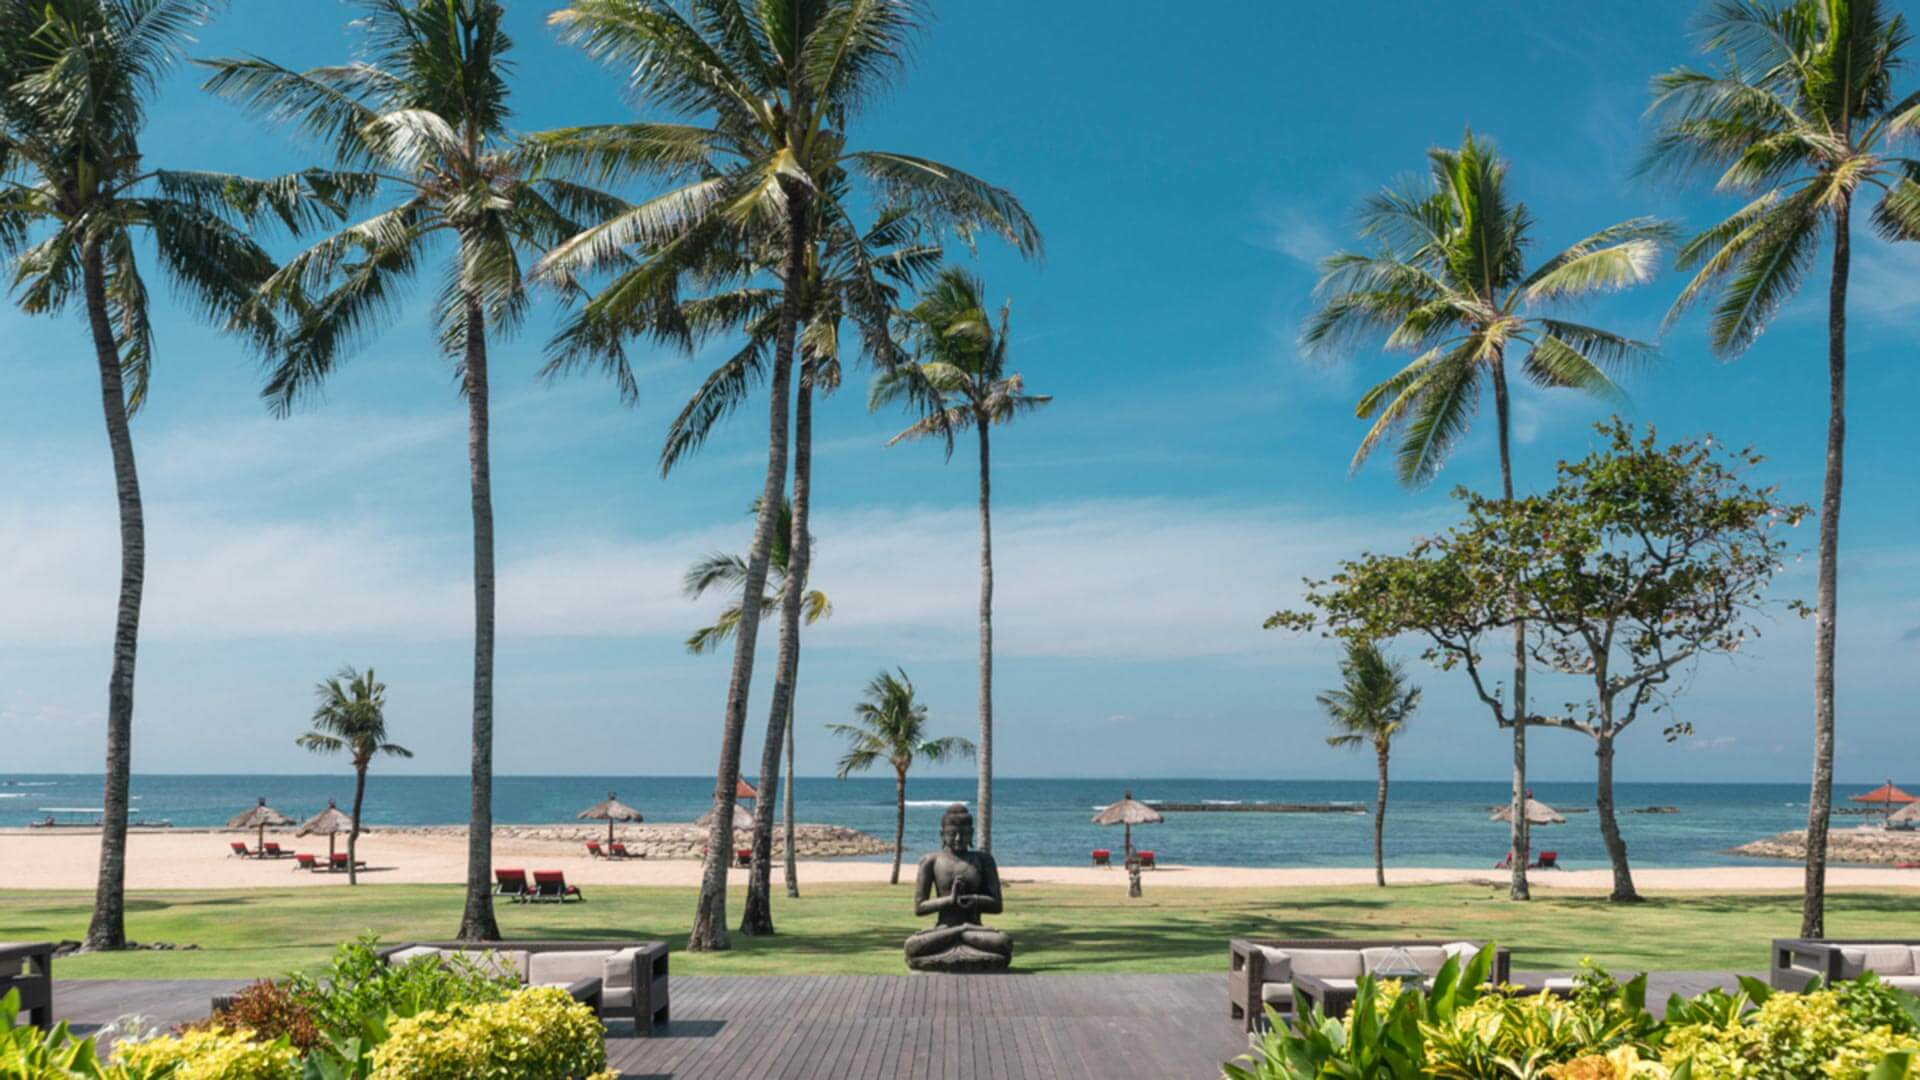 Beach view at Club Med Bali